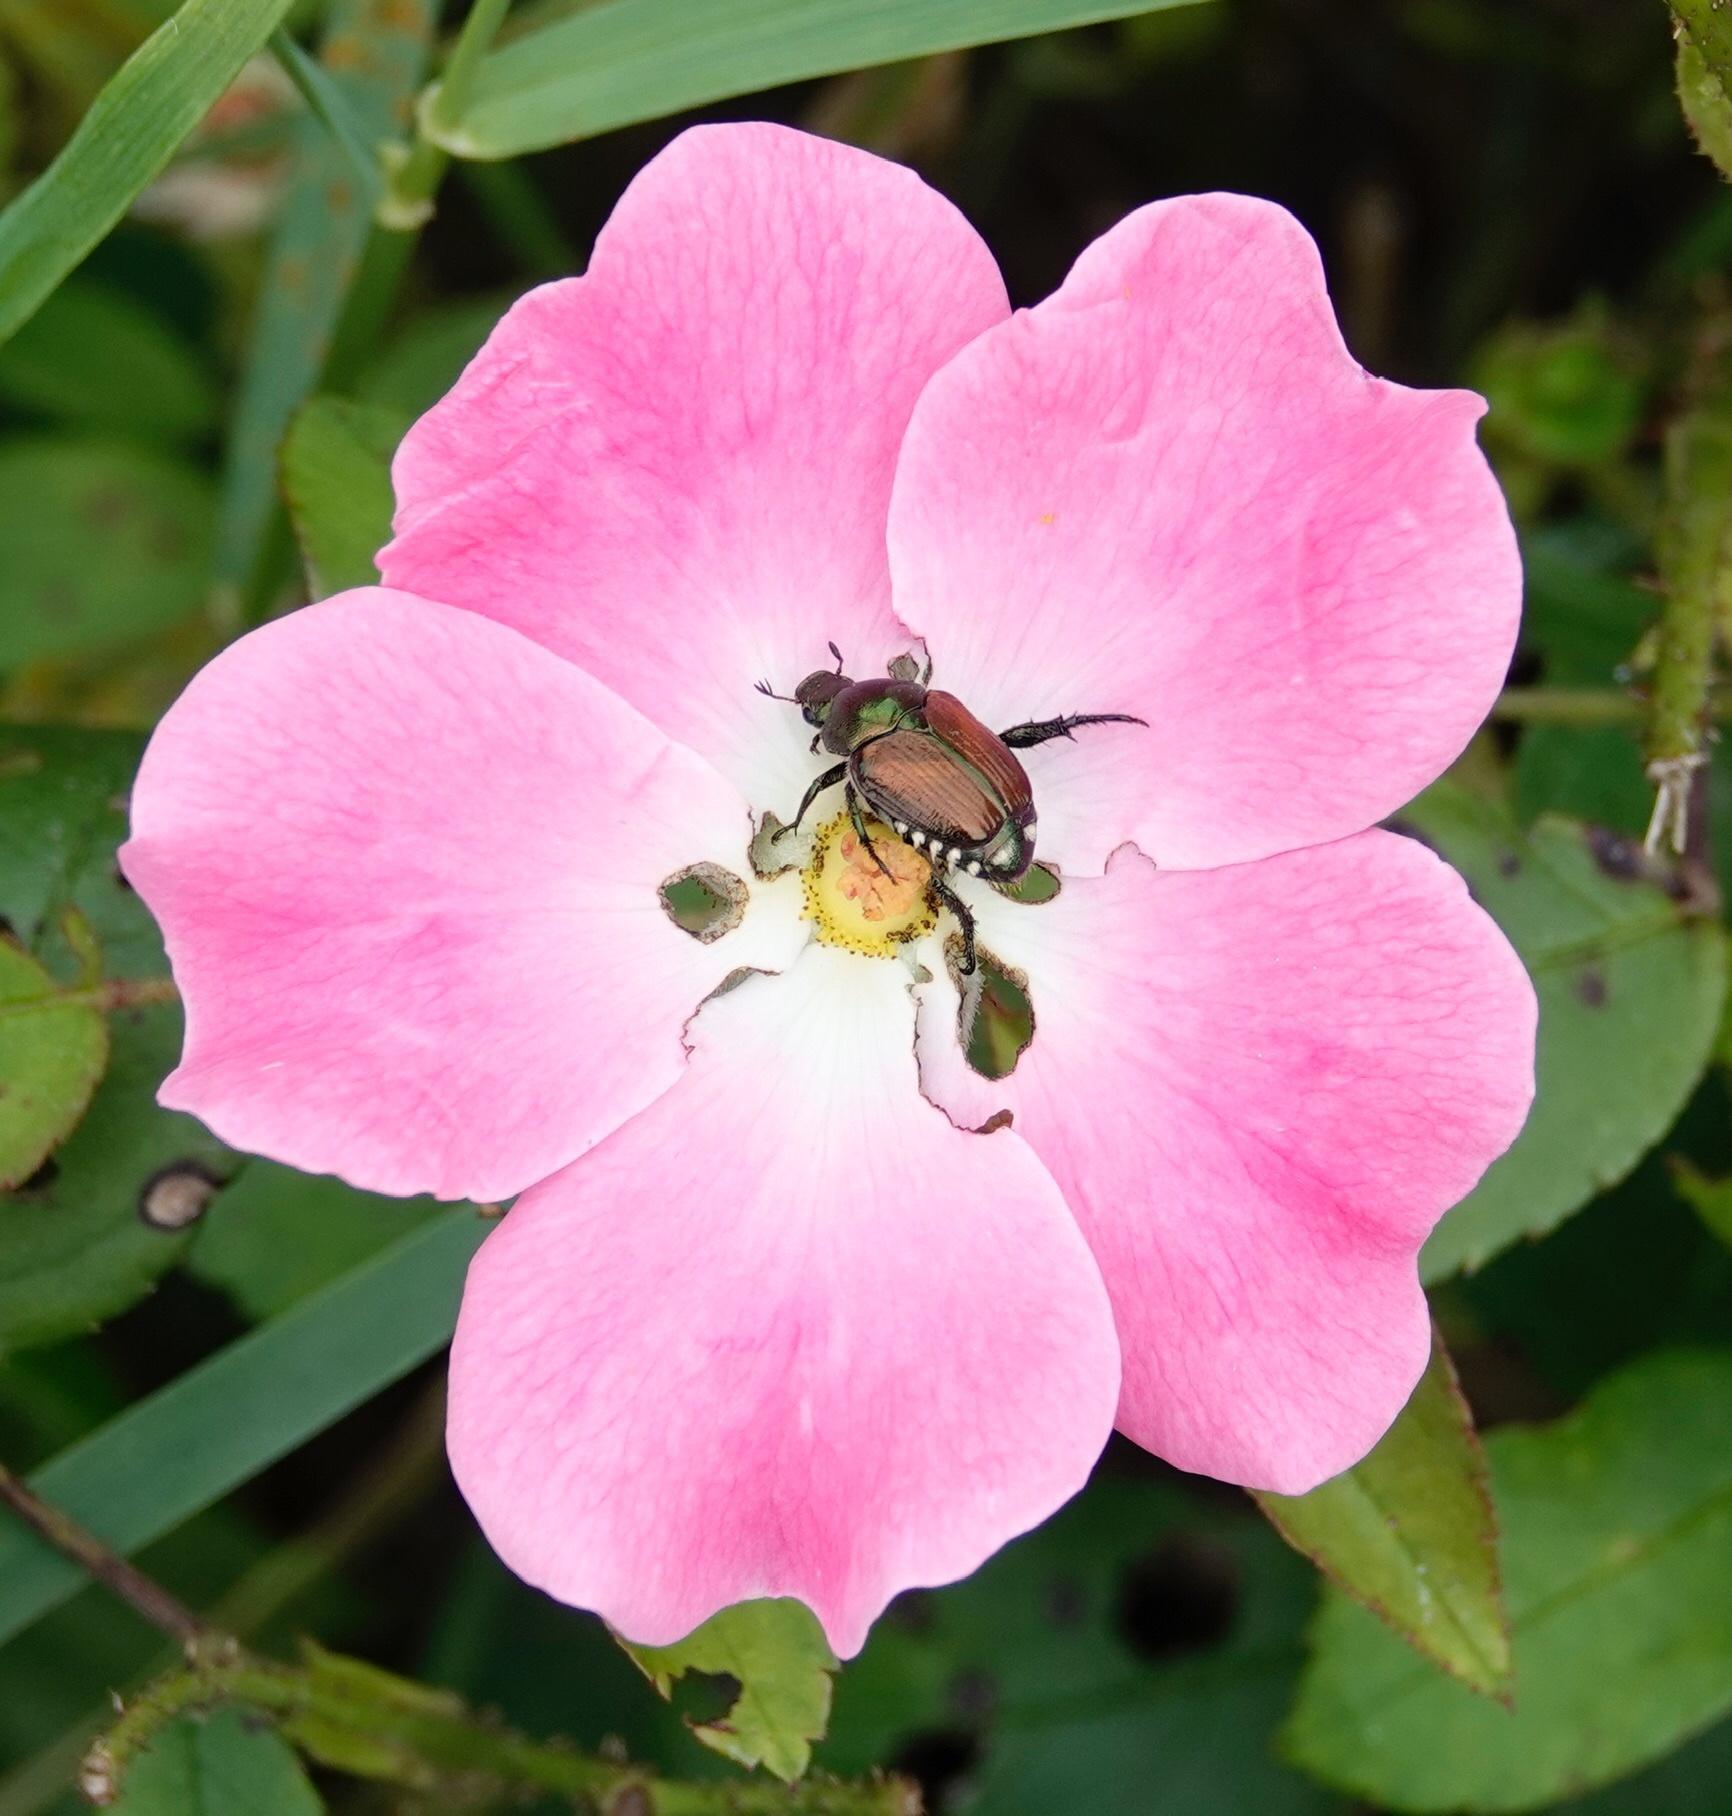 It can be difficult to find a lone Japenese beetle. Al Batt/Albert Lea Tribune